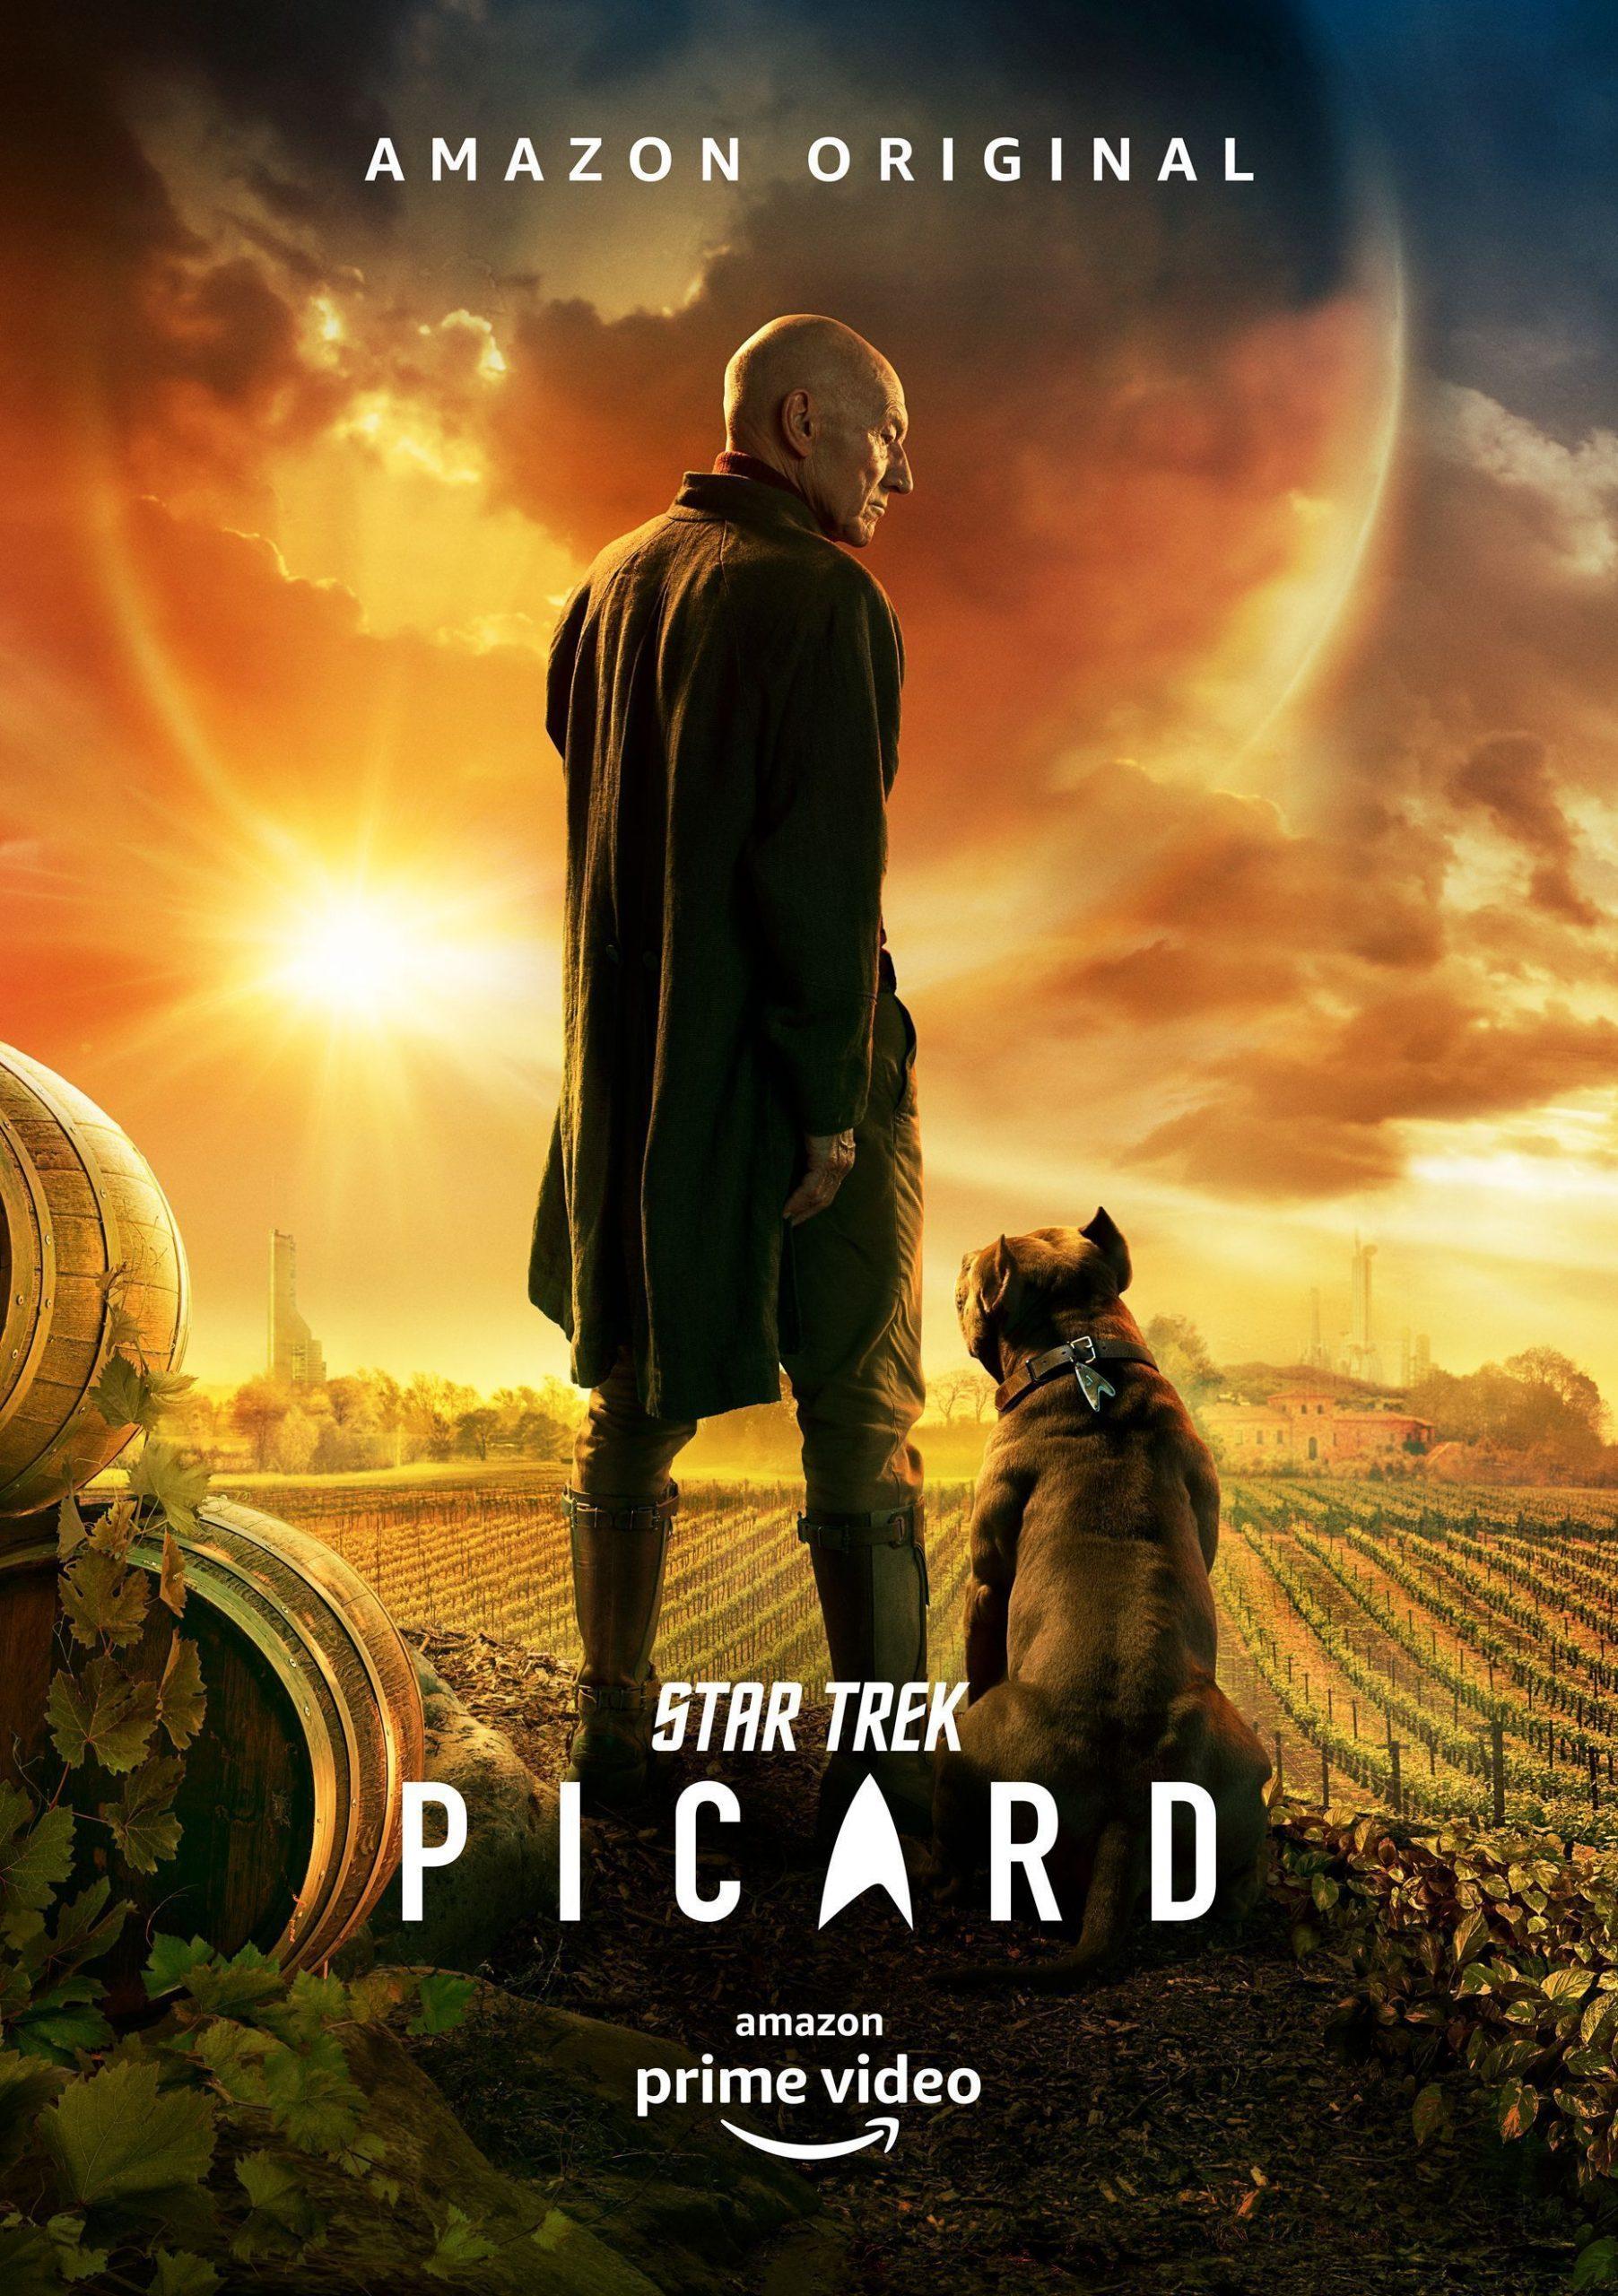 Star Trek Picard, cover